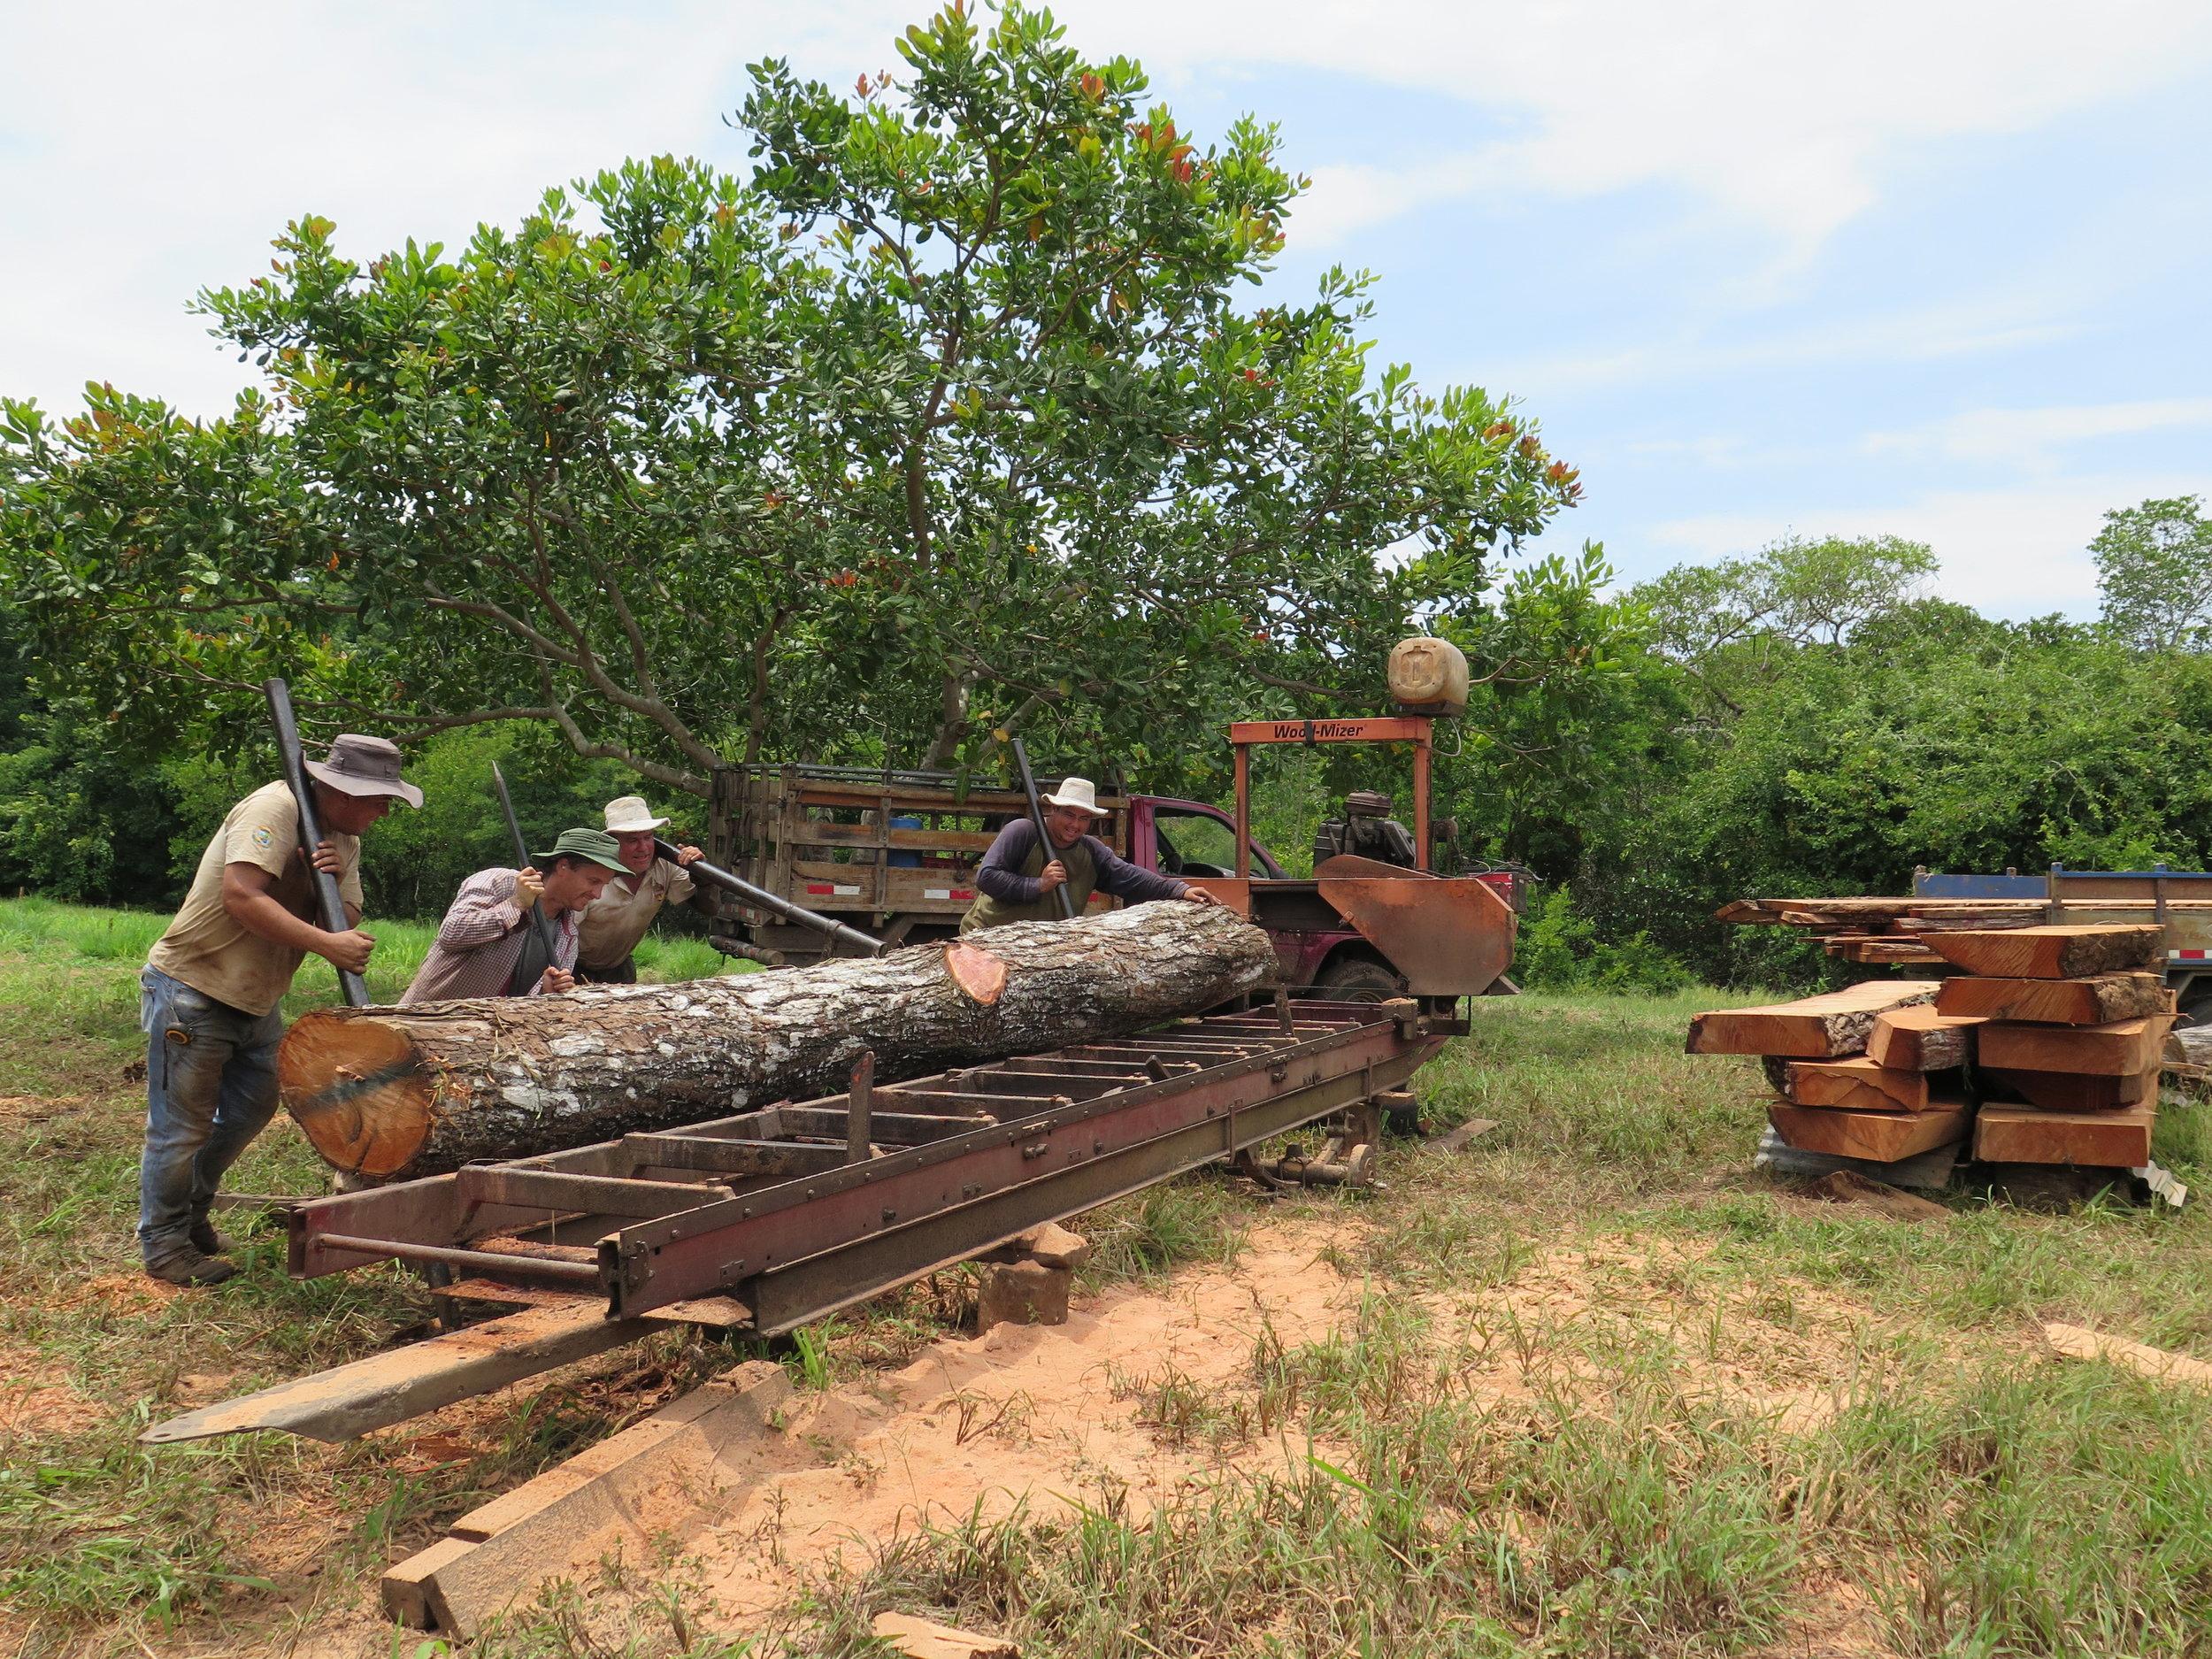 Location: Cocoroca, Punta Morales. Shipyard.  Milling the 'Cedro Amargo' (Spanish Cedar) with the Costa Rican sawyers / lumberjacks